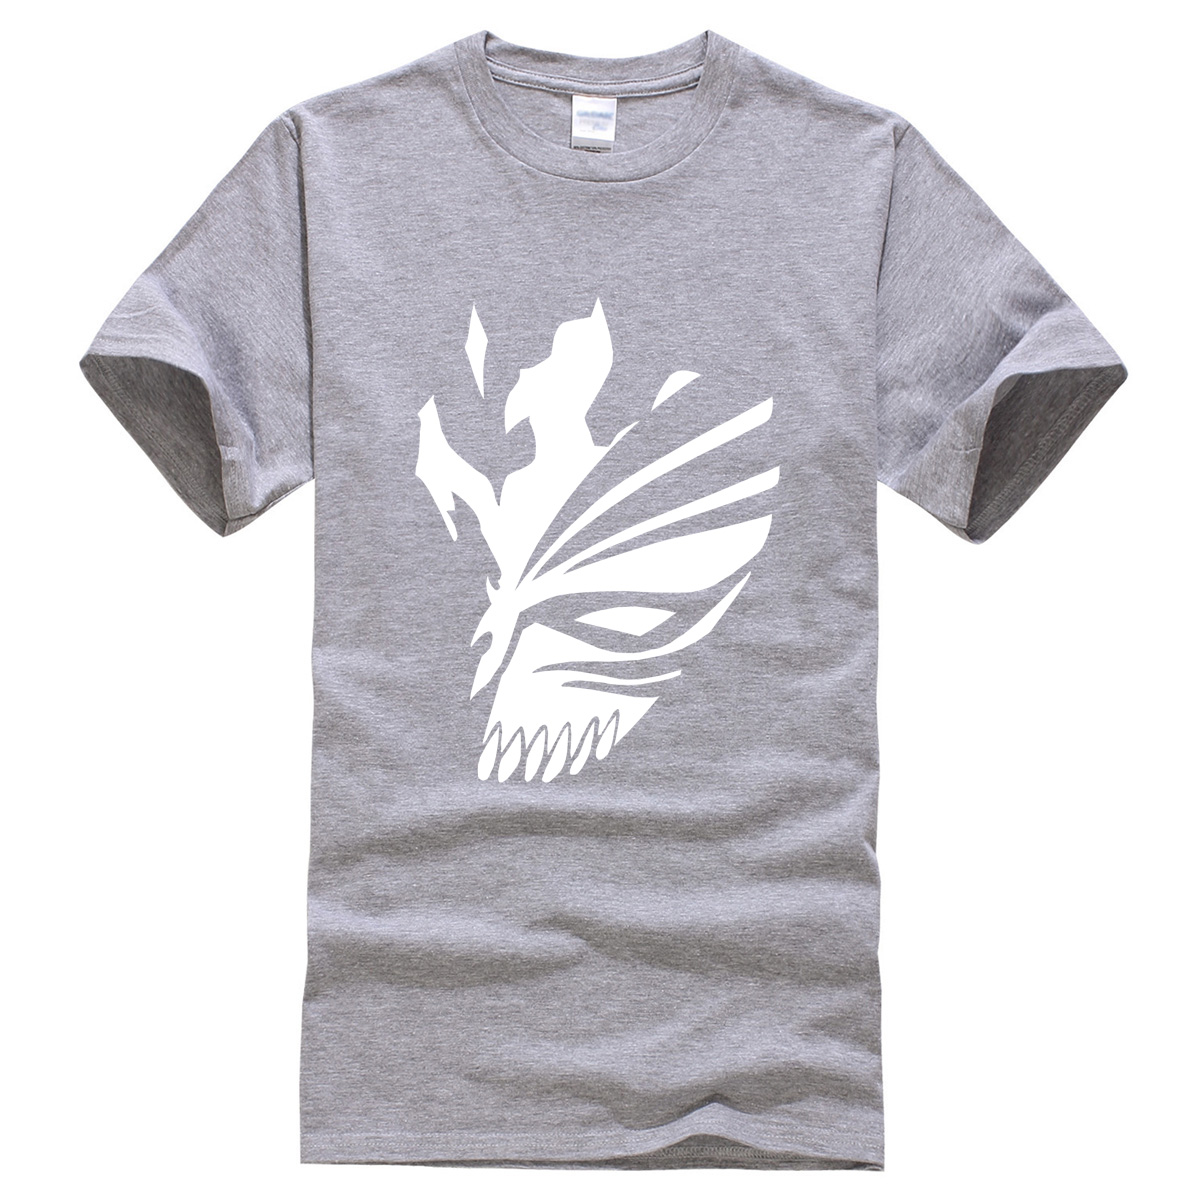 Gray Bleach T-Shirt Anime